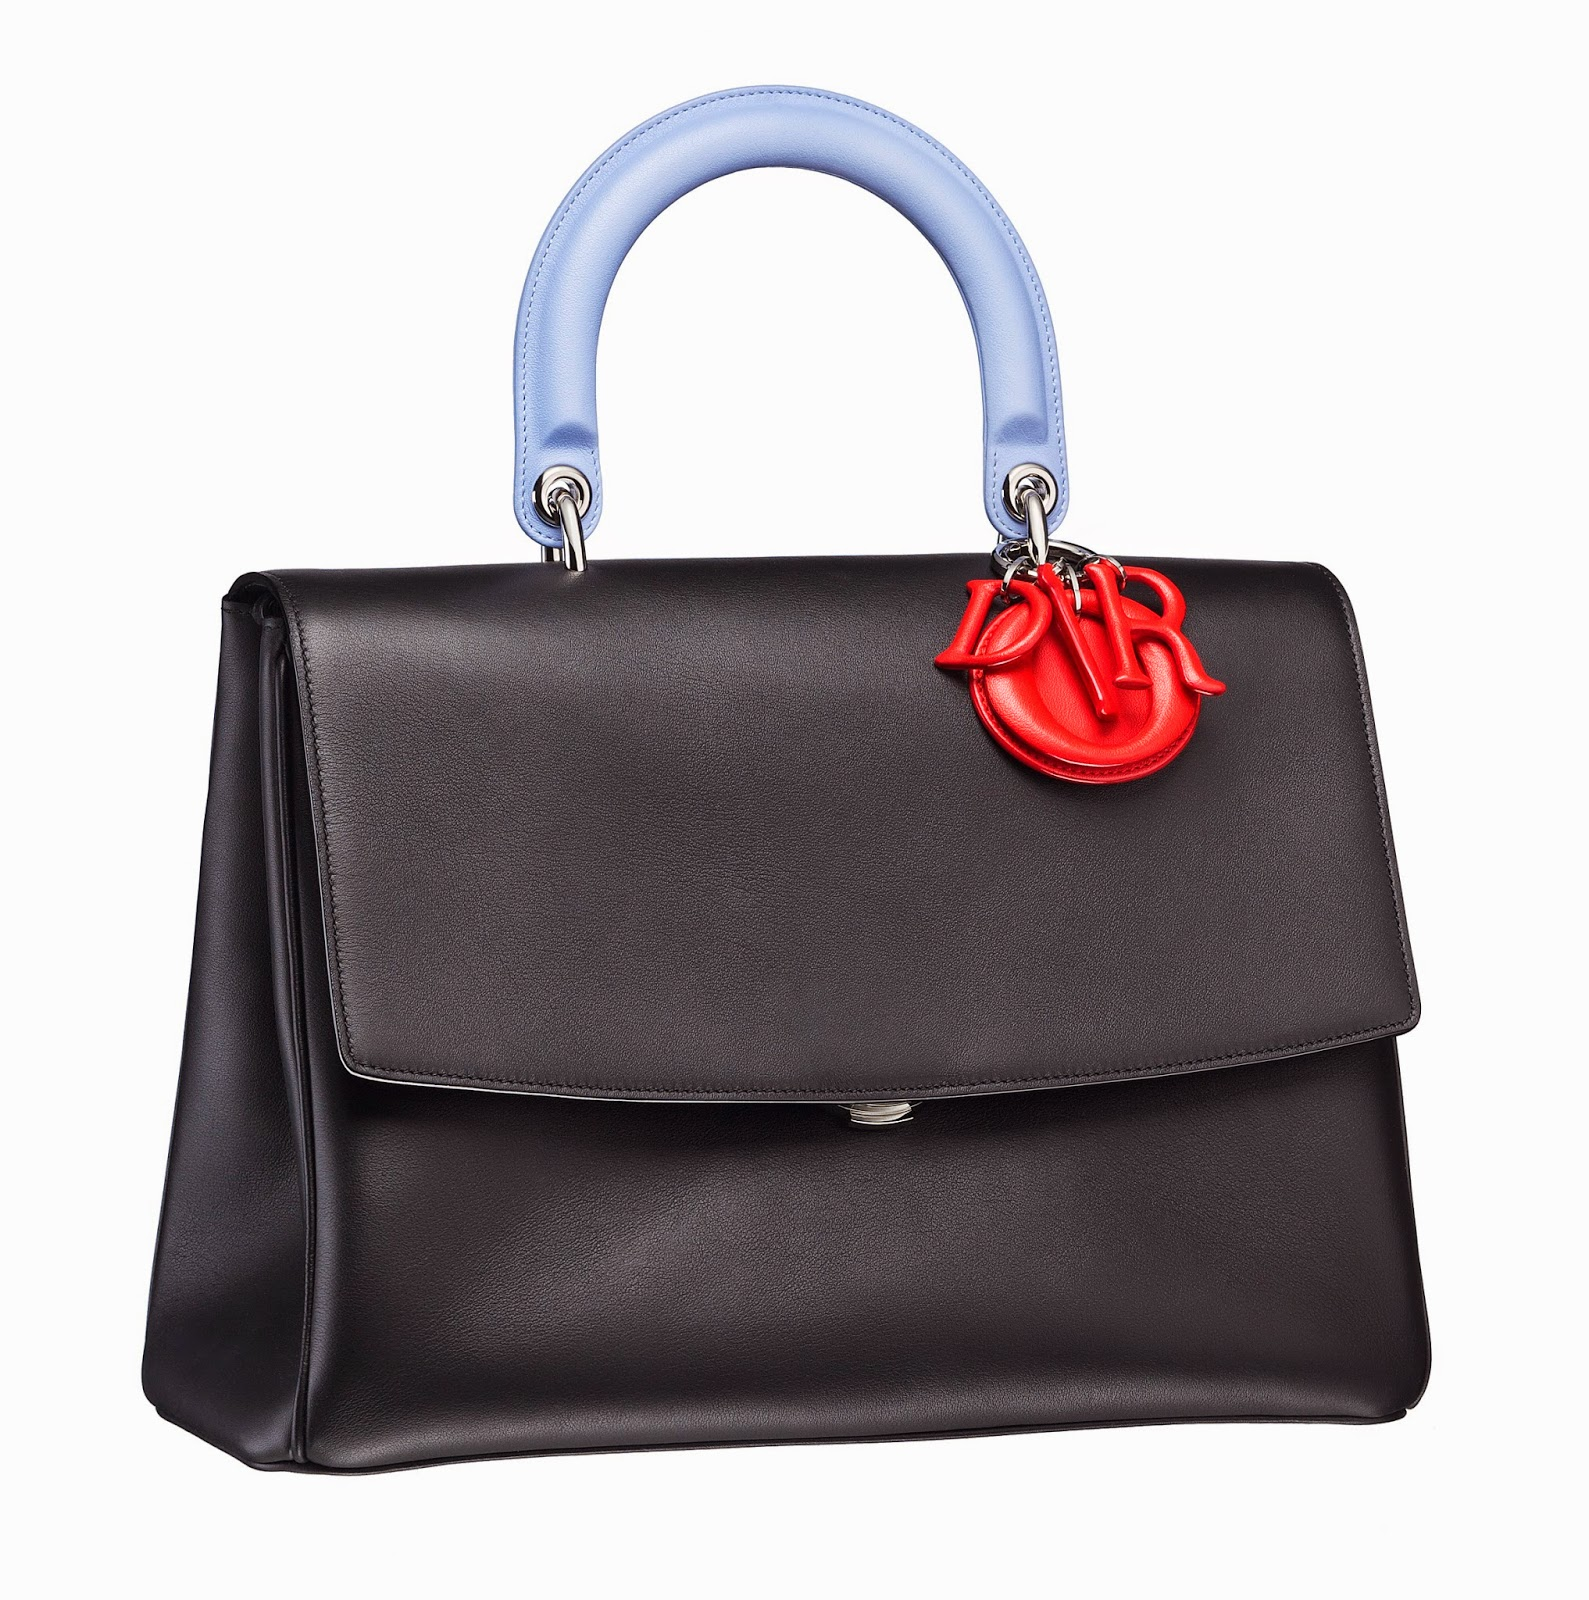 "Dior's New ""Be Dior"" Bag"